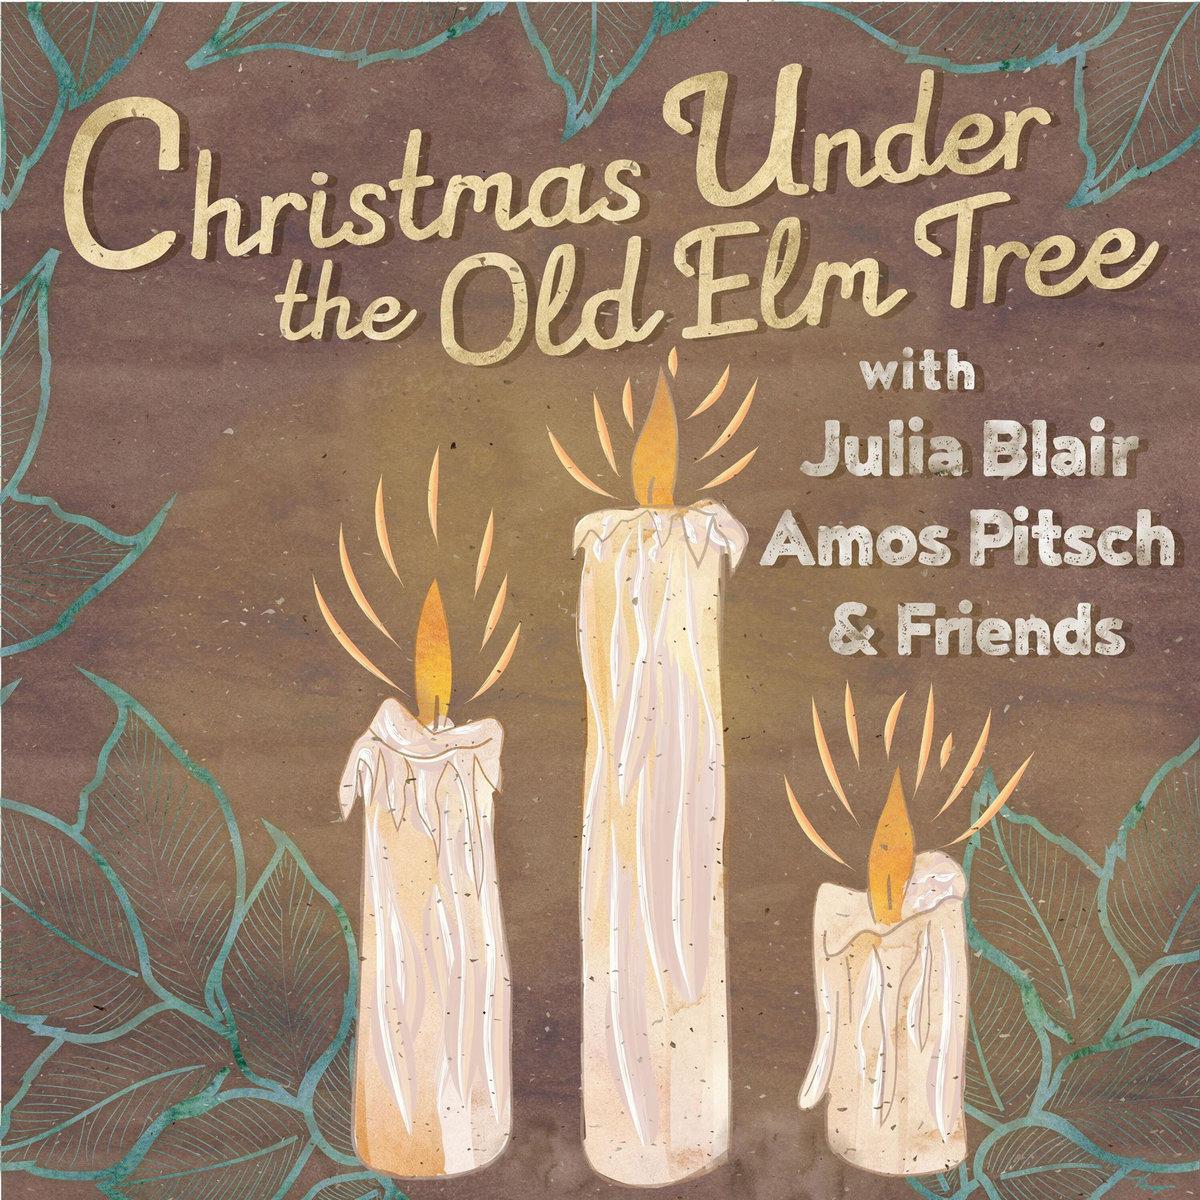 Christmas Under the Old Elm Tree artwork